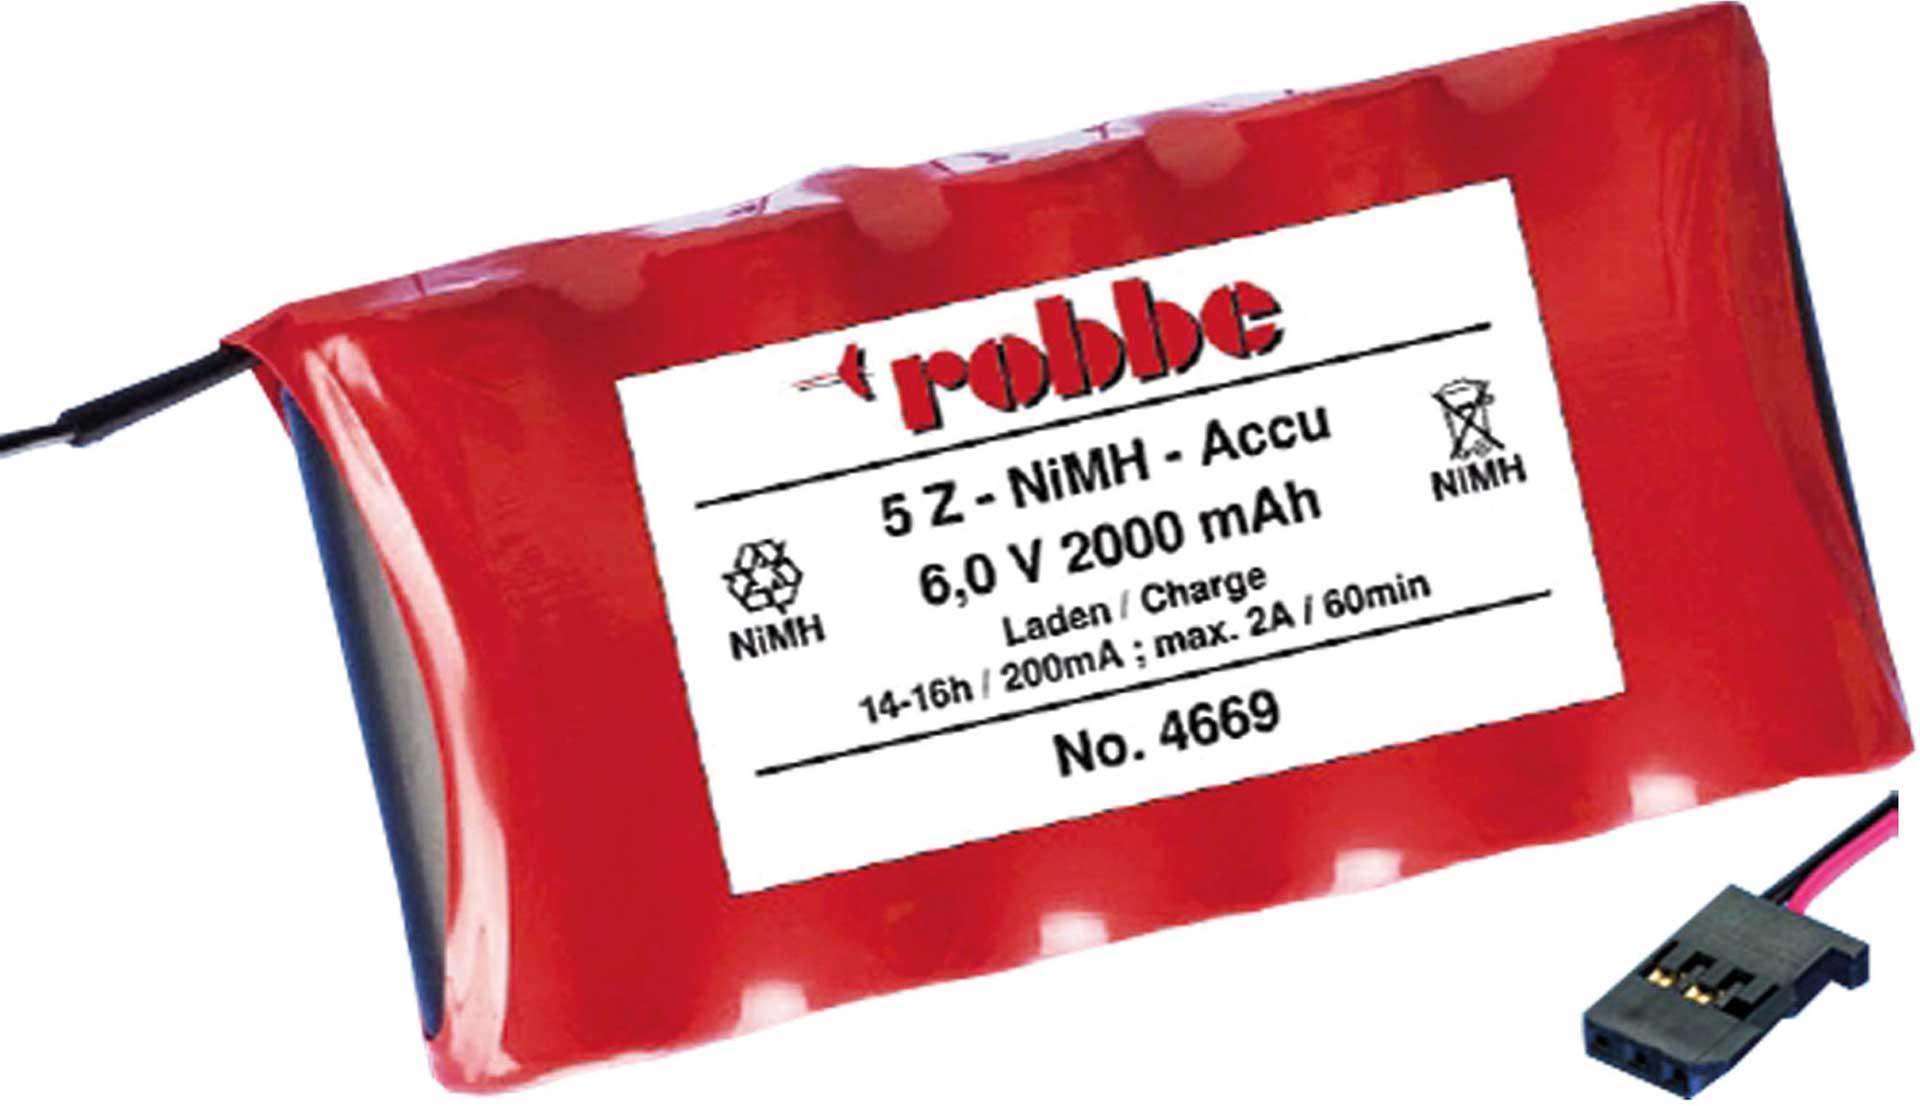 ROBBE SENDERAKKU 2000MAH/6V NIMH 4/5A T6J